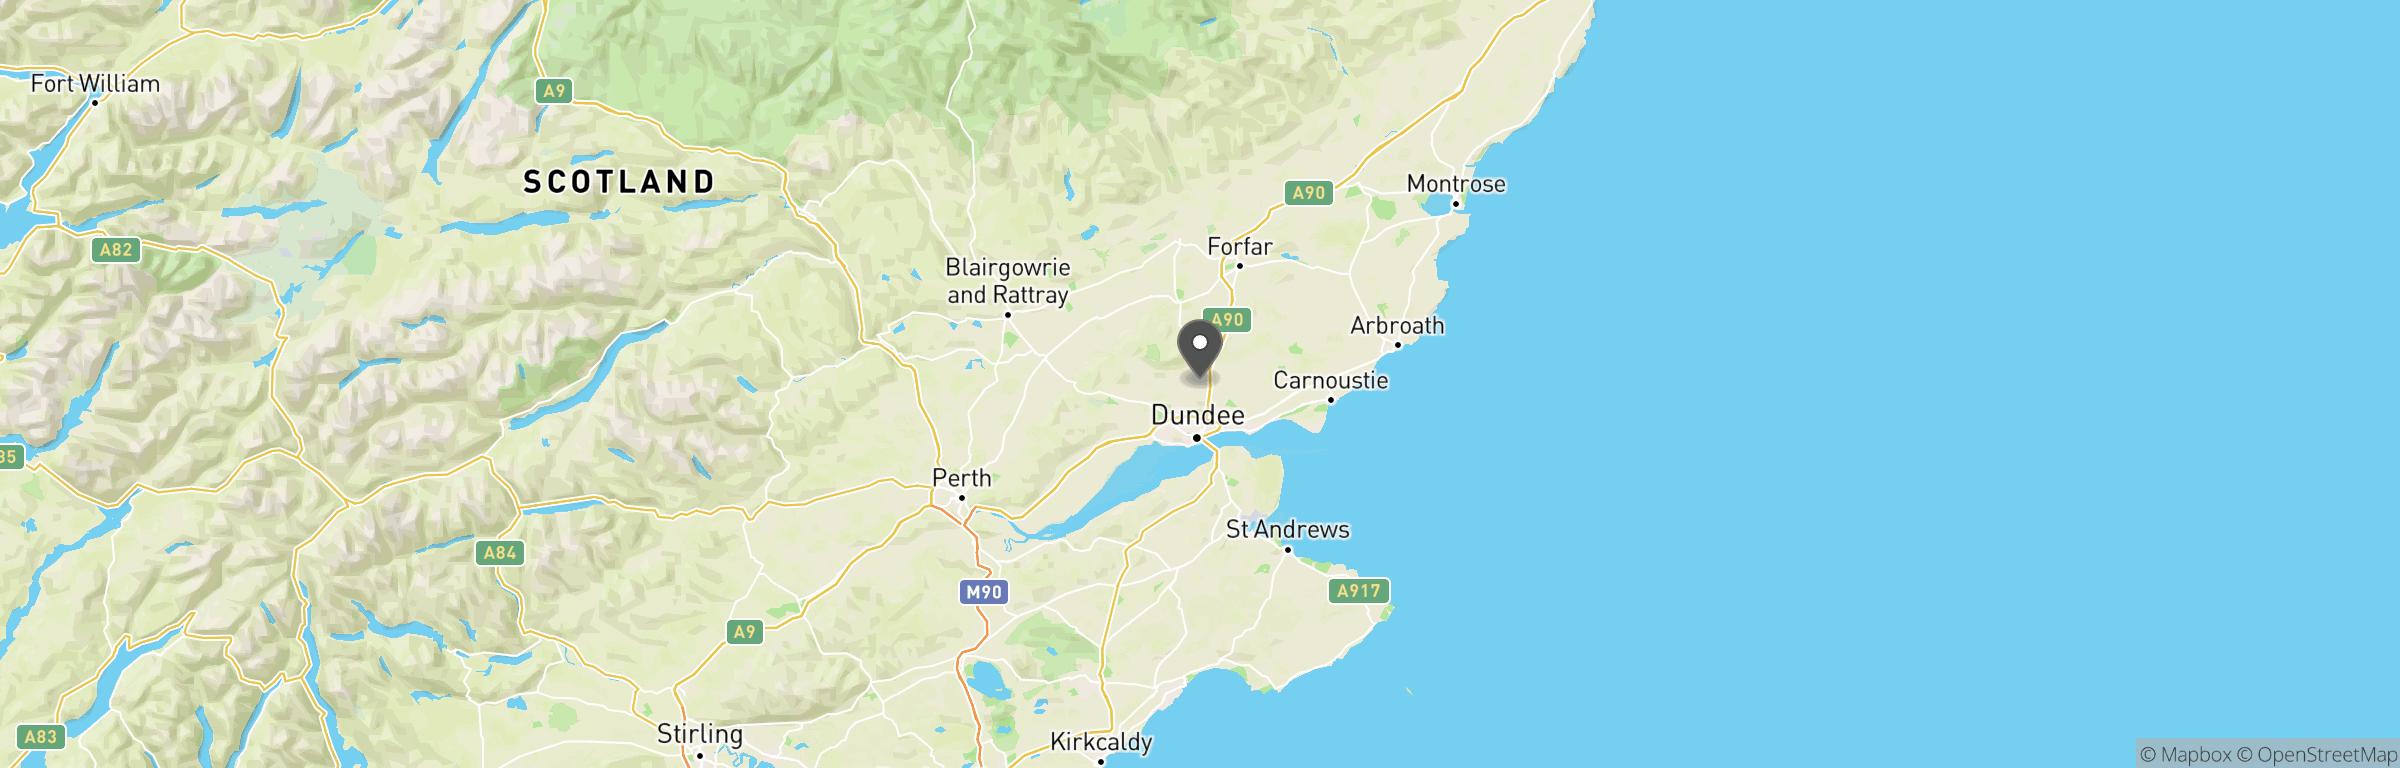 Location map of Viper Strike